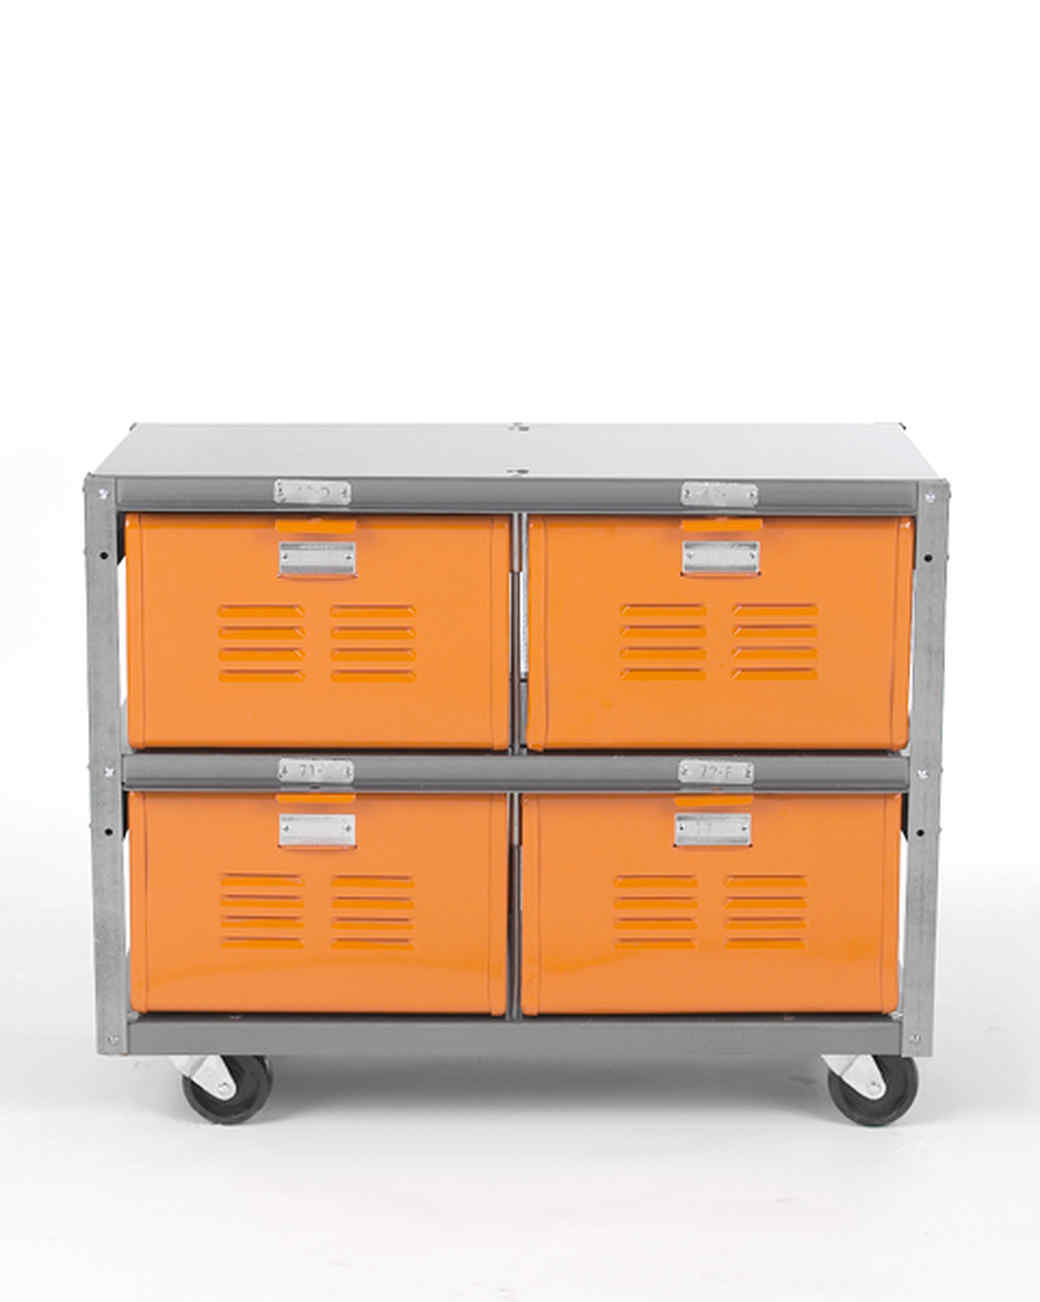 organizing-solutions-01-d100196-0915.jpg